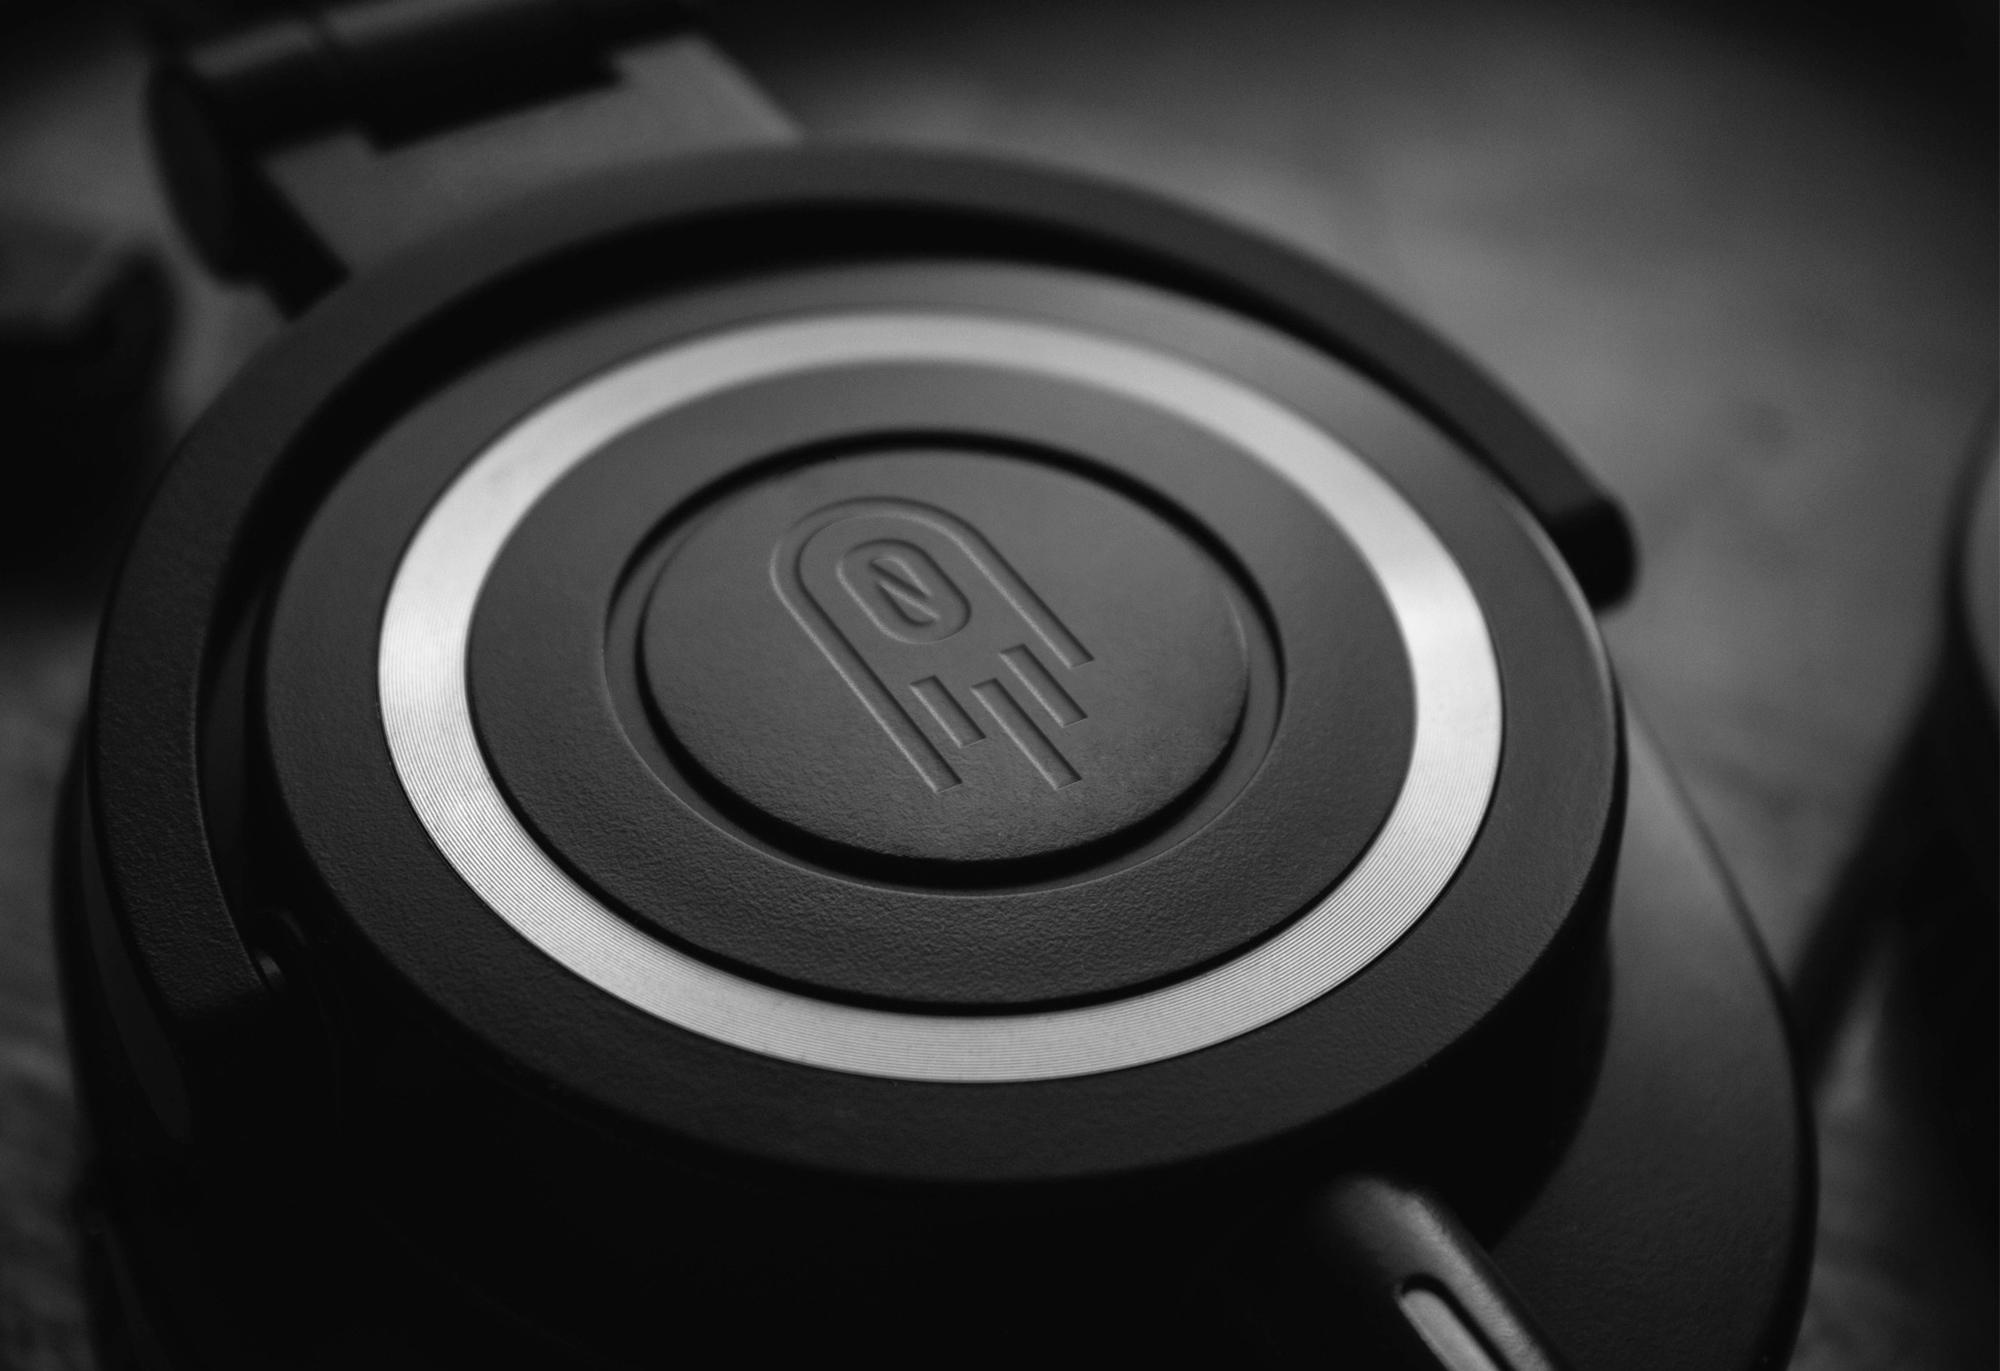 gh0stam-Headphone-Mockup.jpg